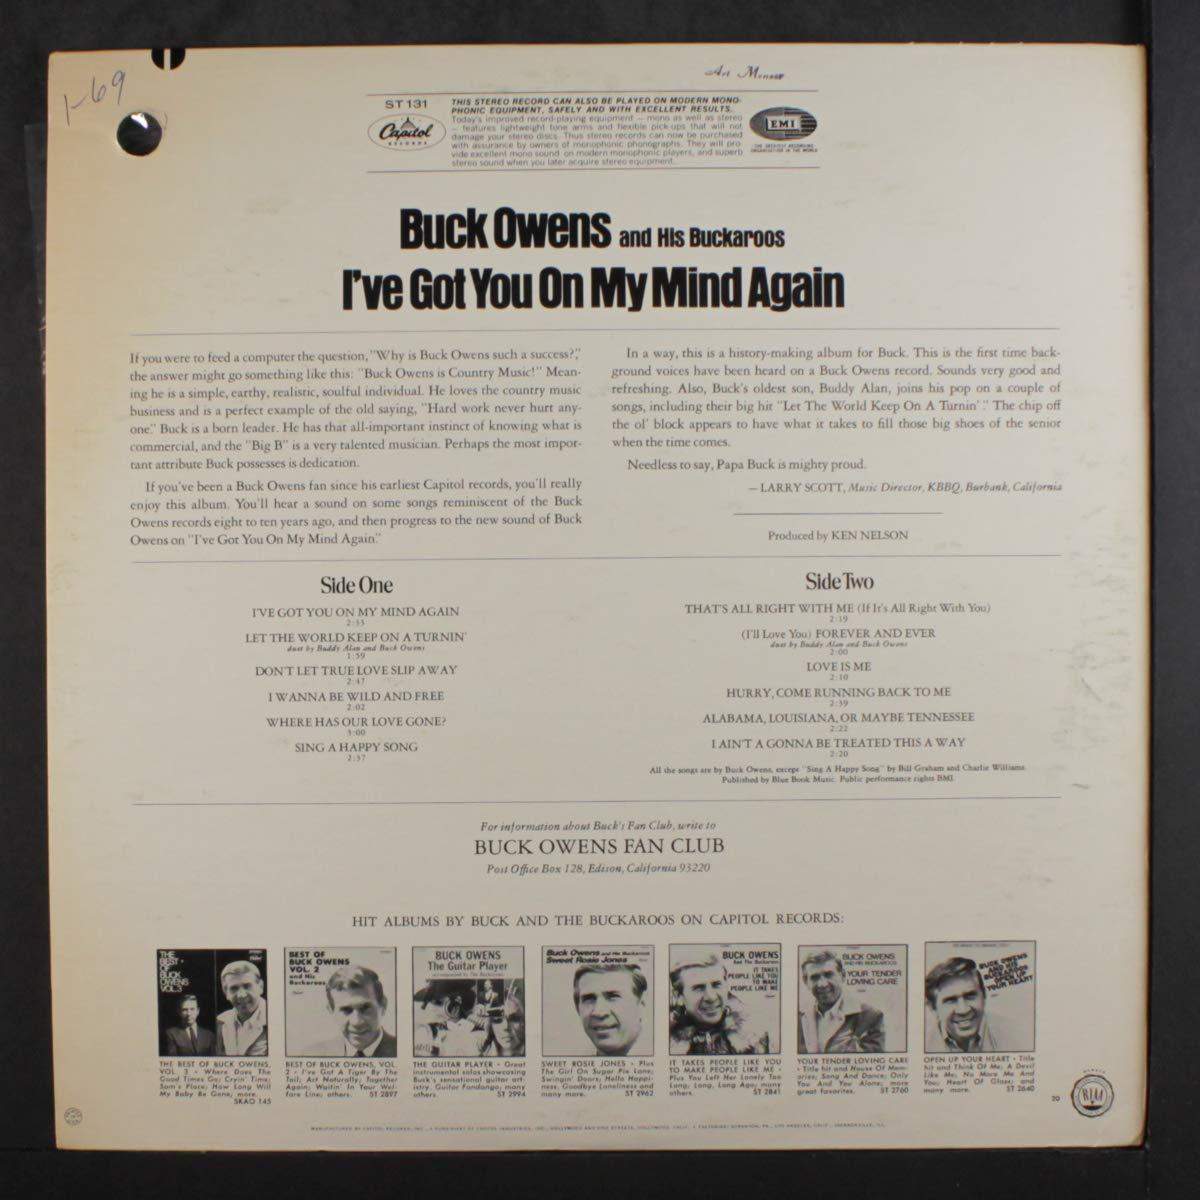 BUCK OWENS - ive got you on my mind again LP - Amazon.com Music